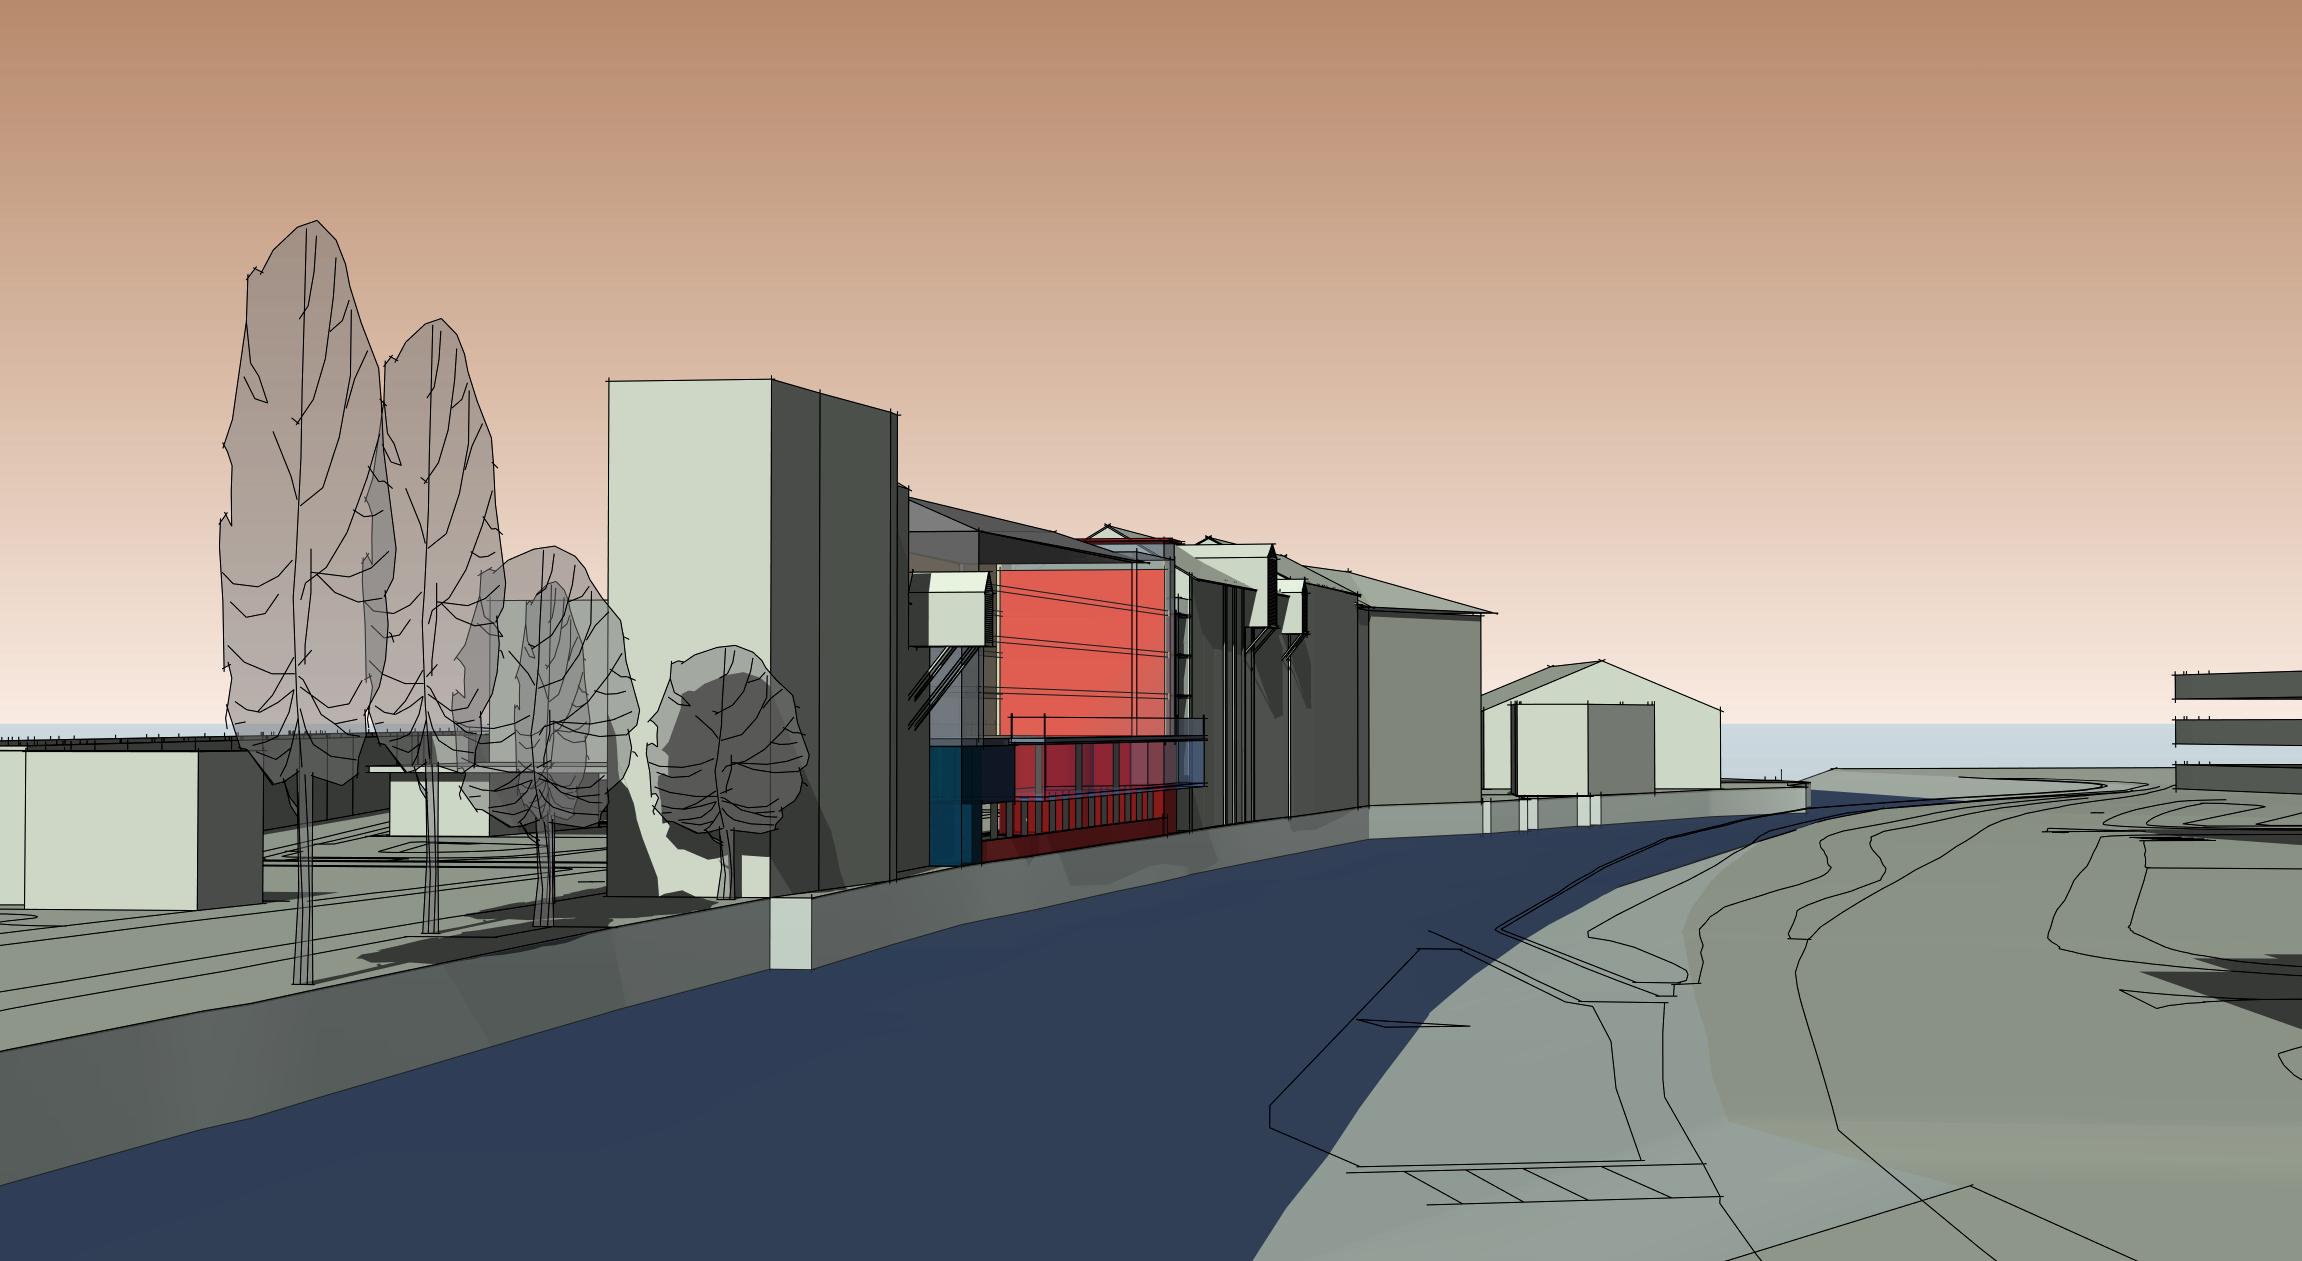 NEW BUILD OFFICE FEASIBILITY, BURO HAPPOLD ENGINEERS, BATH UK